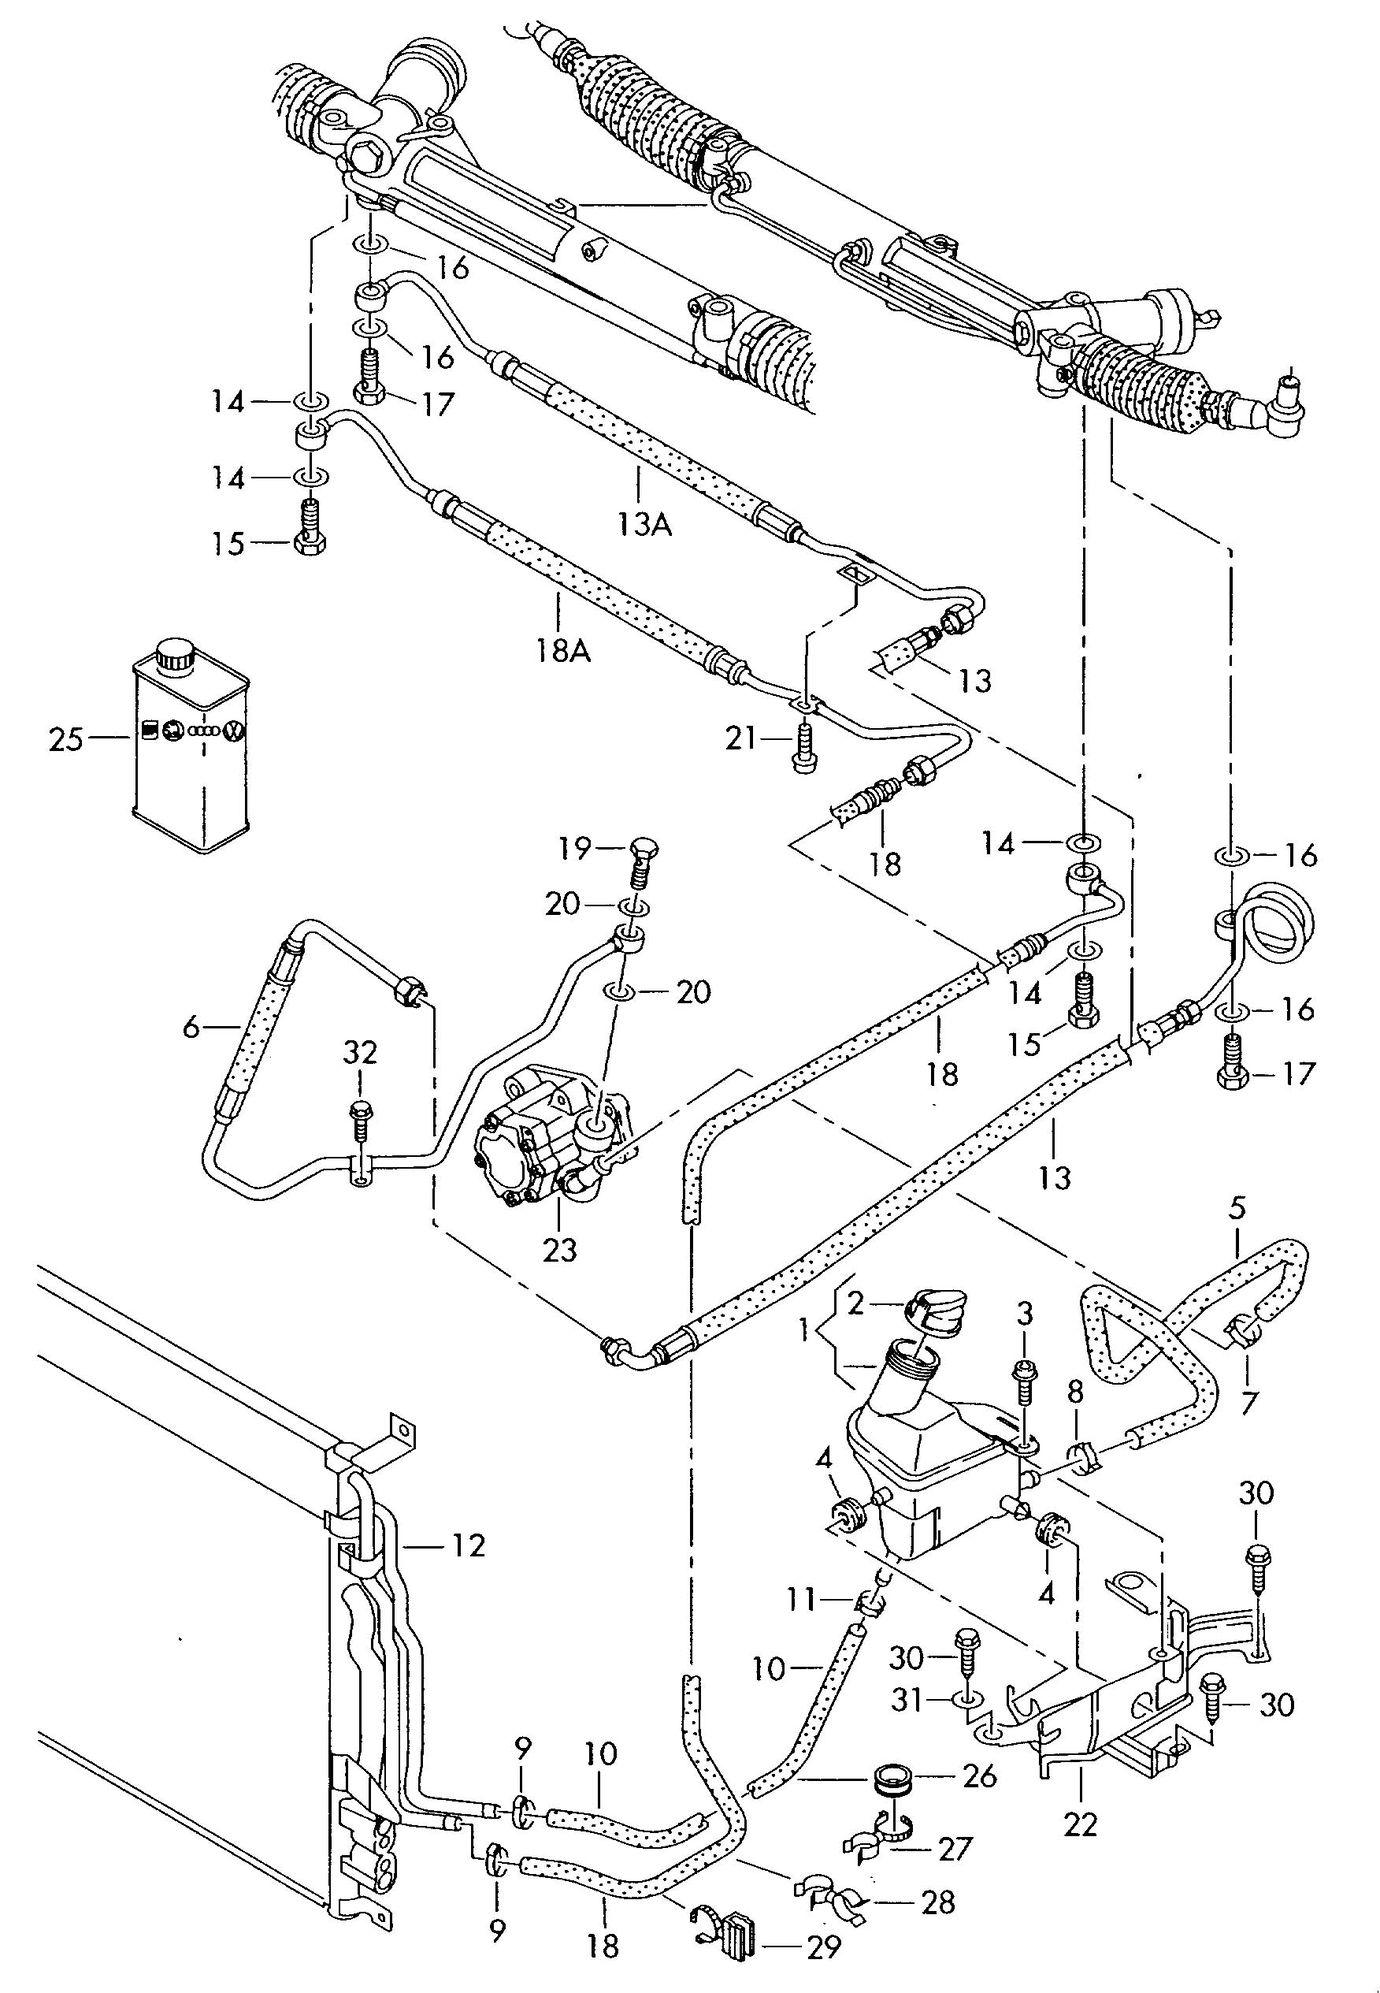 Sophisticated 2000 audi tt brake warning light wiring diagram